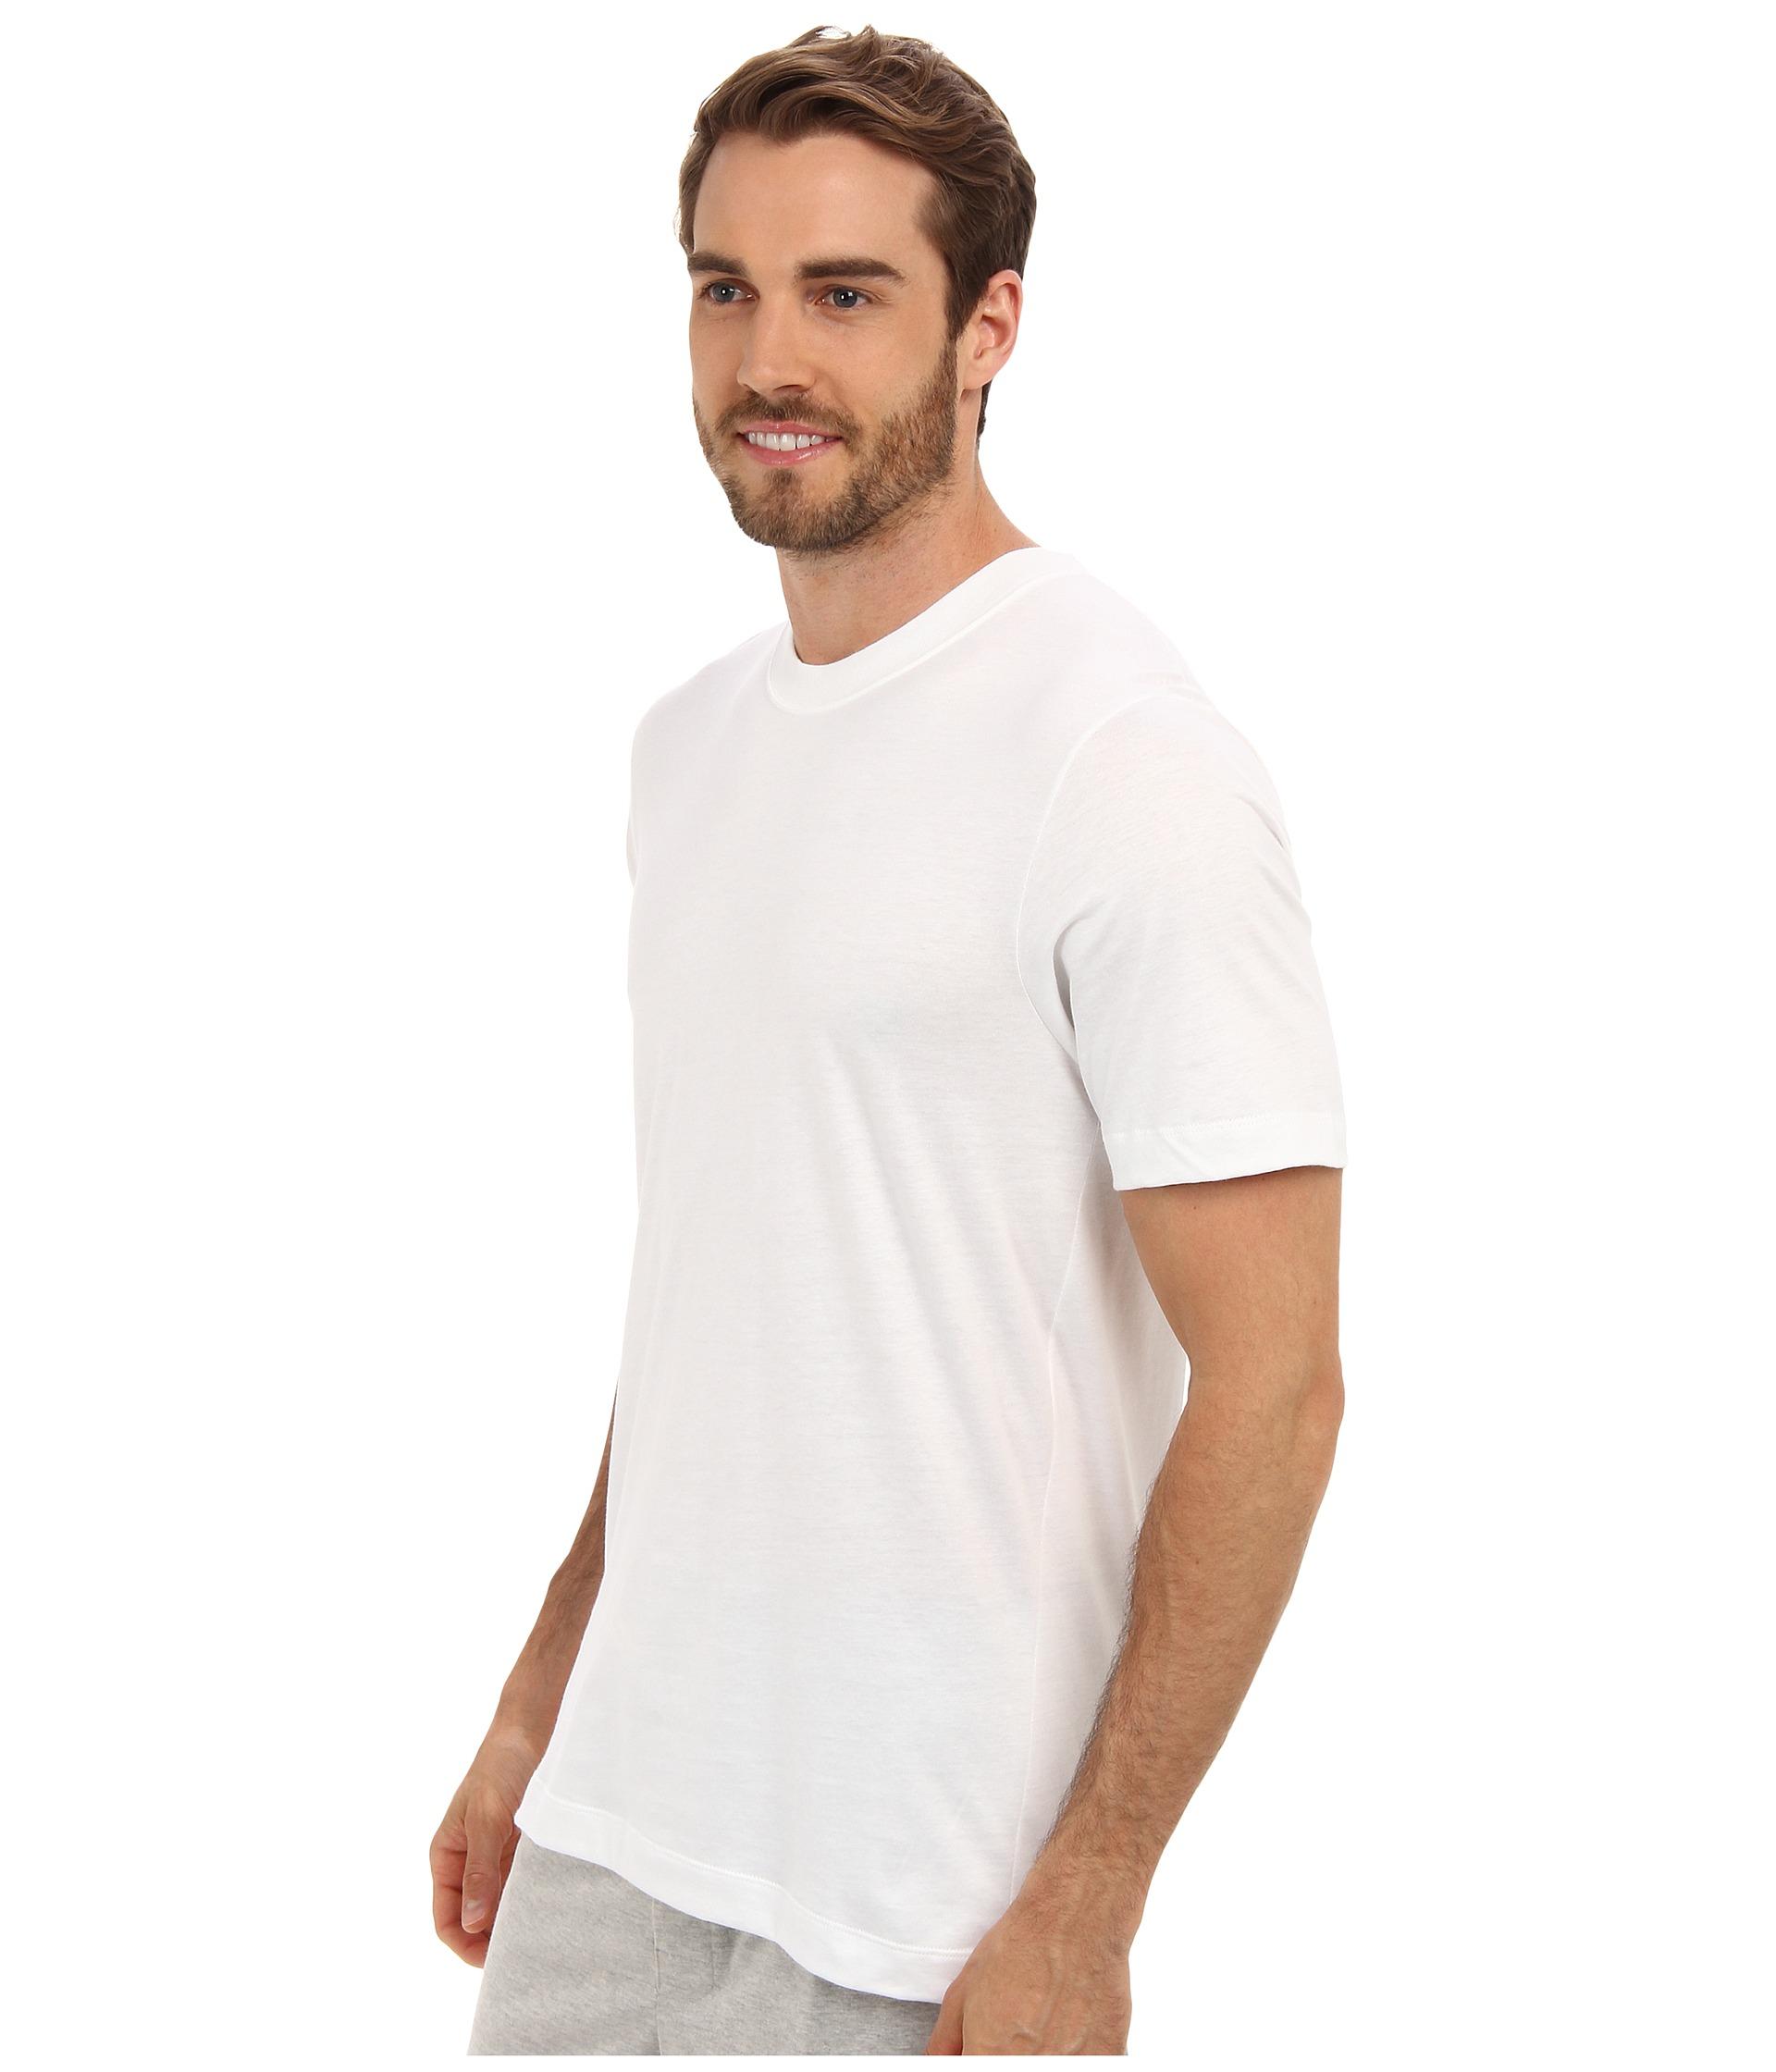 Jockey Staycool Crew Neck T-Shirt 2-Pack at Zappos.com